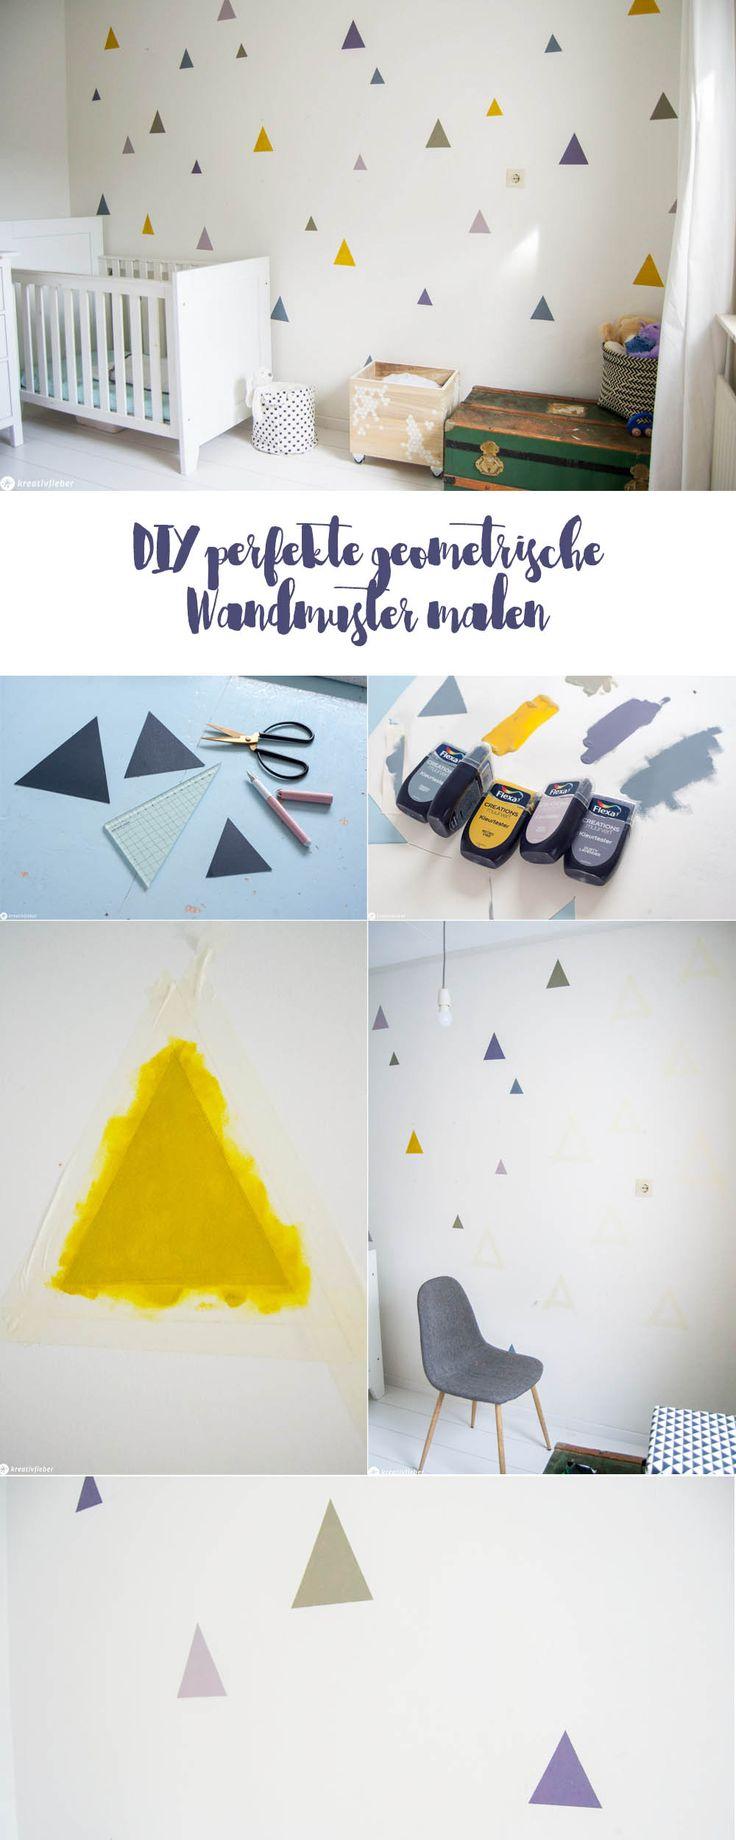 DIY perfekte geometrische Wandmuster malen